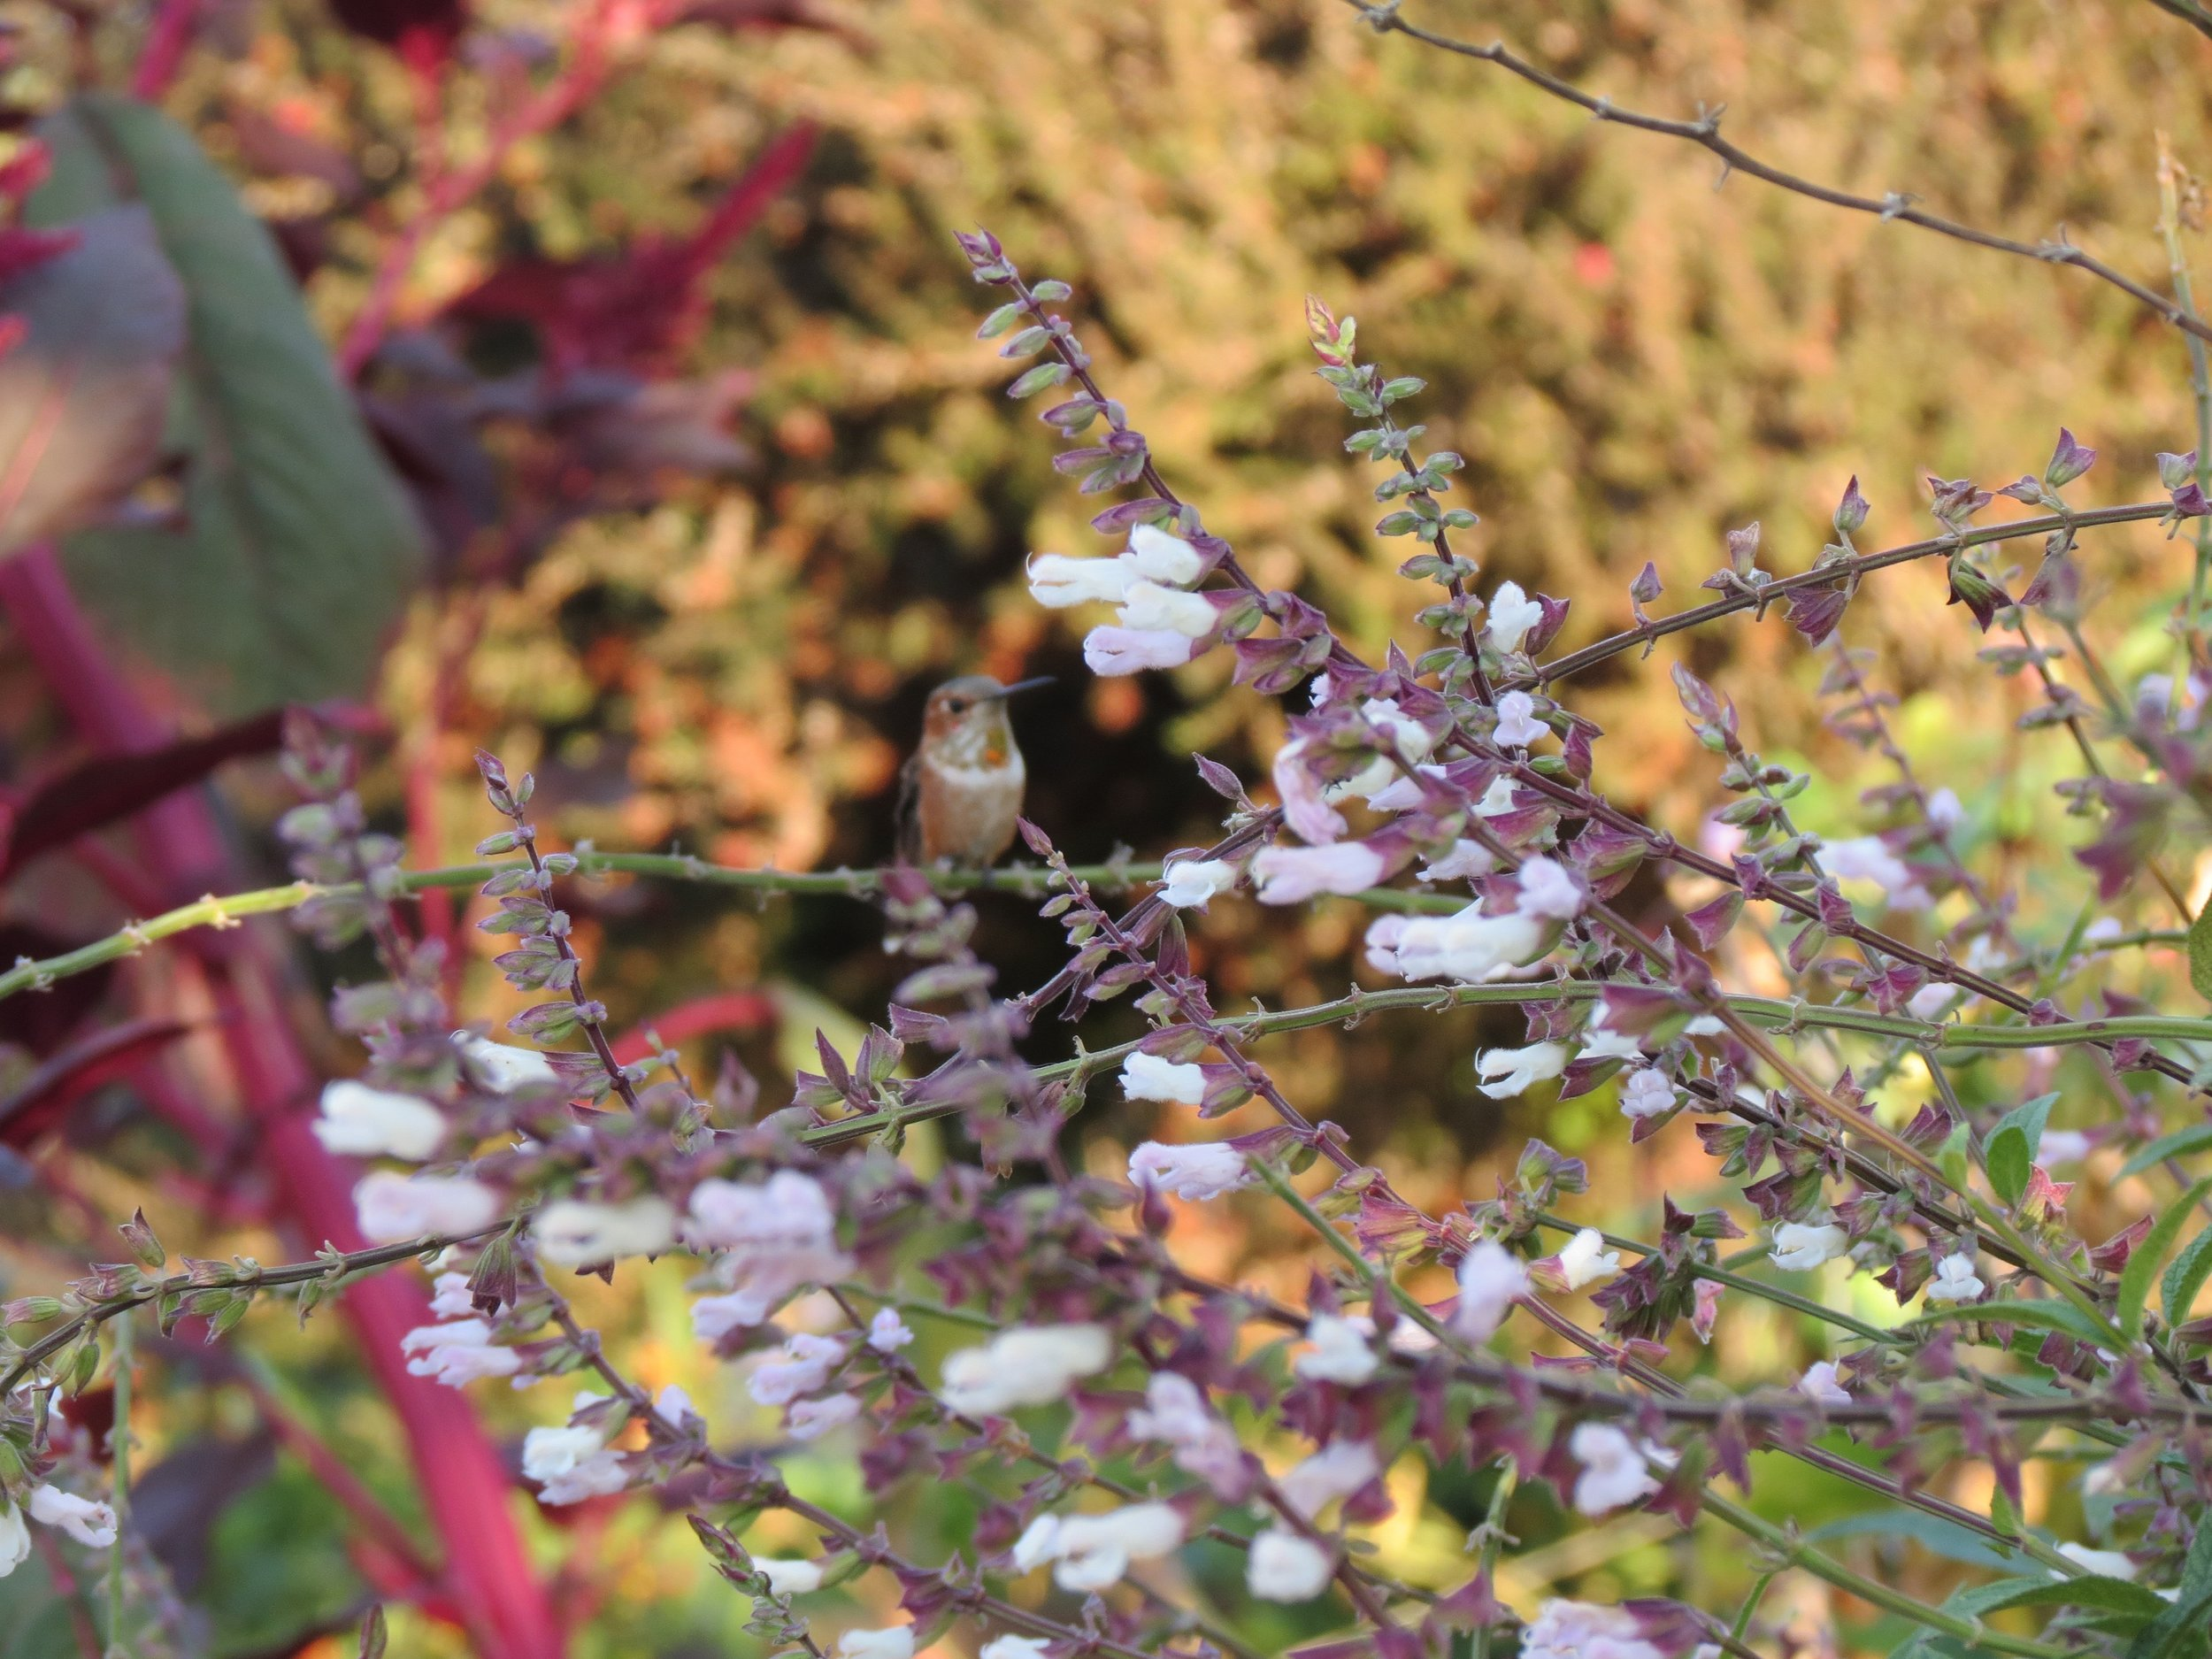 Stephanie Luke - Allen's Hummingbird